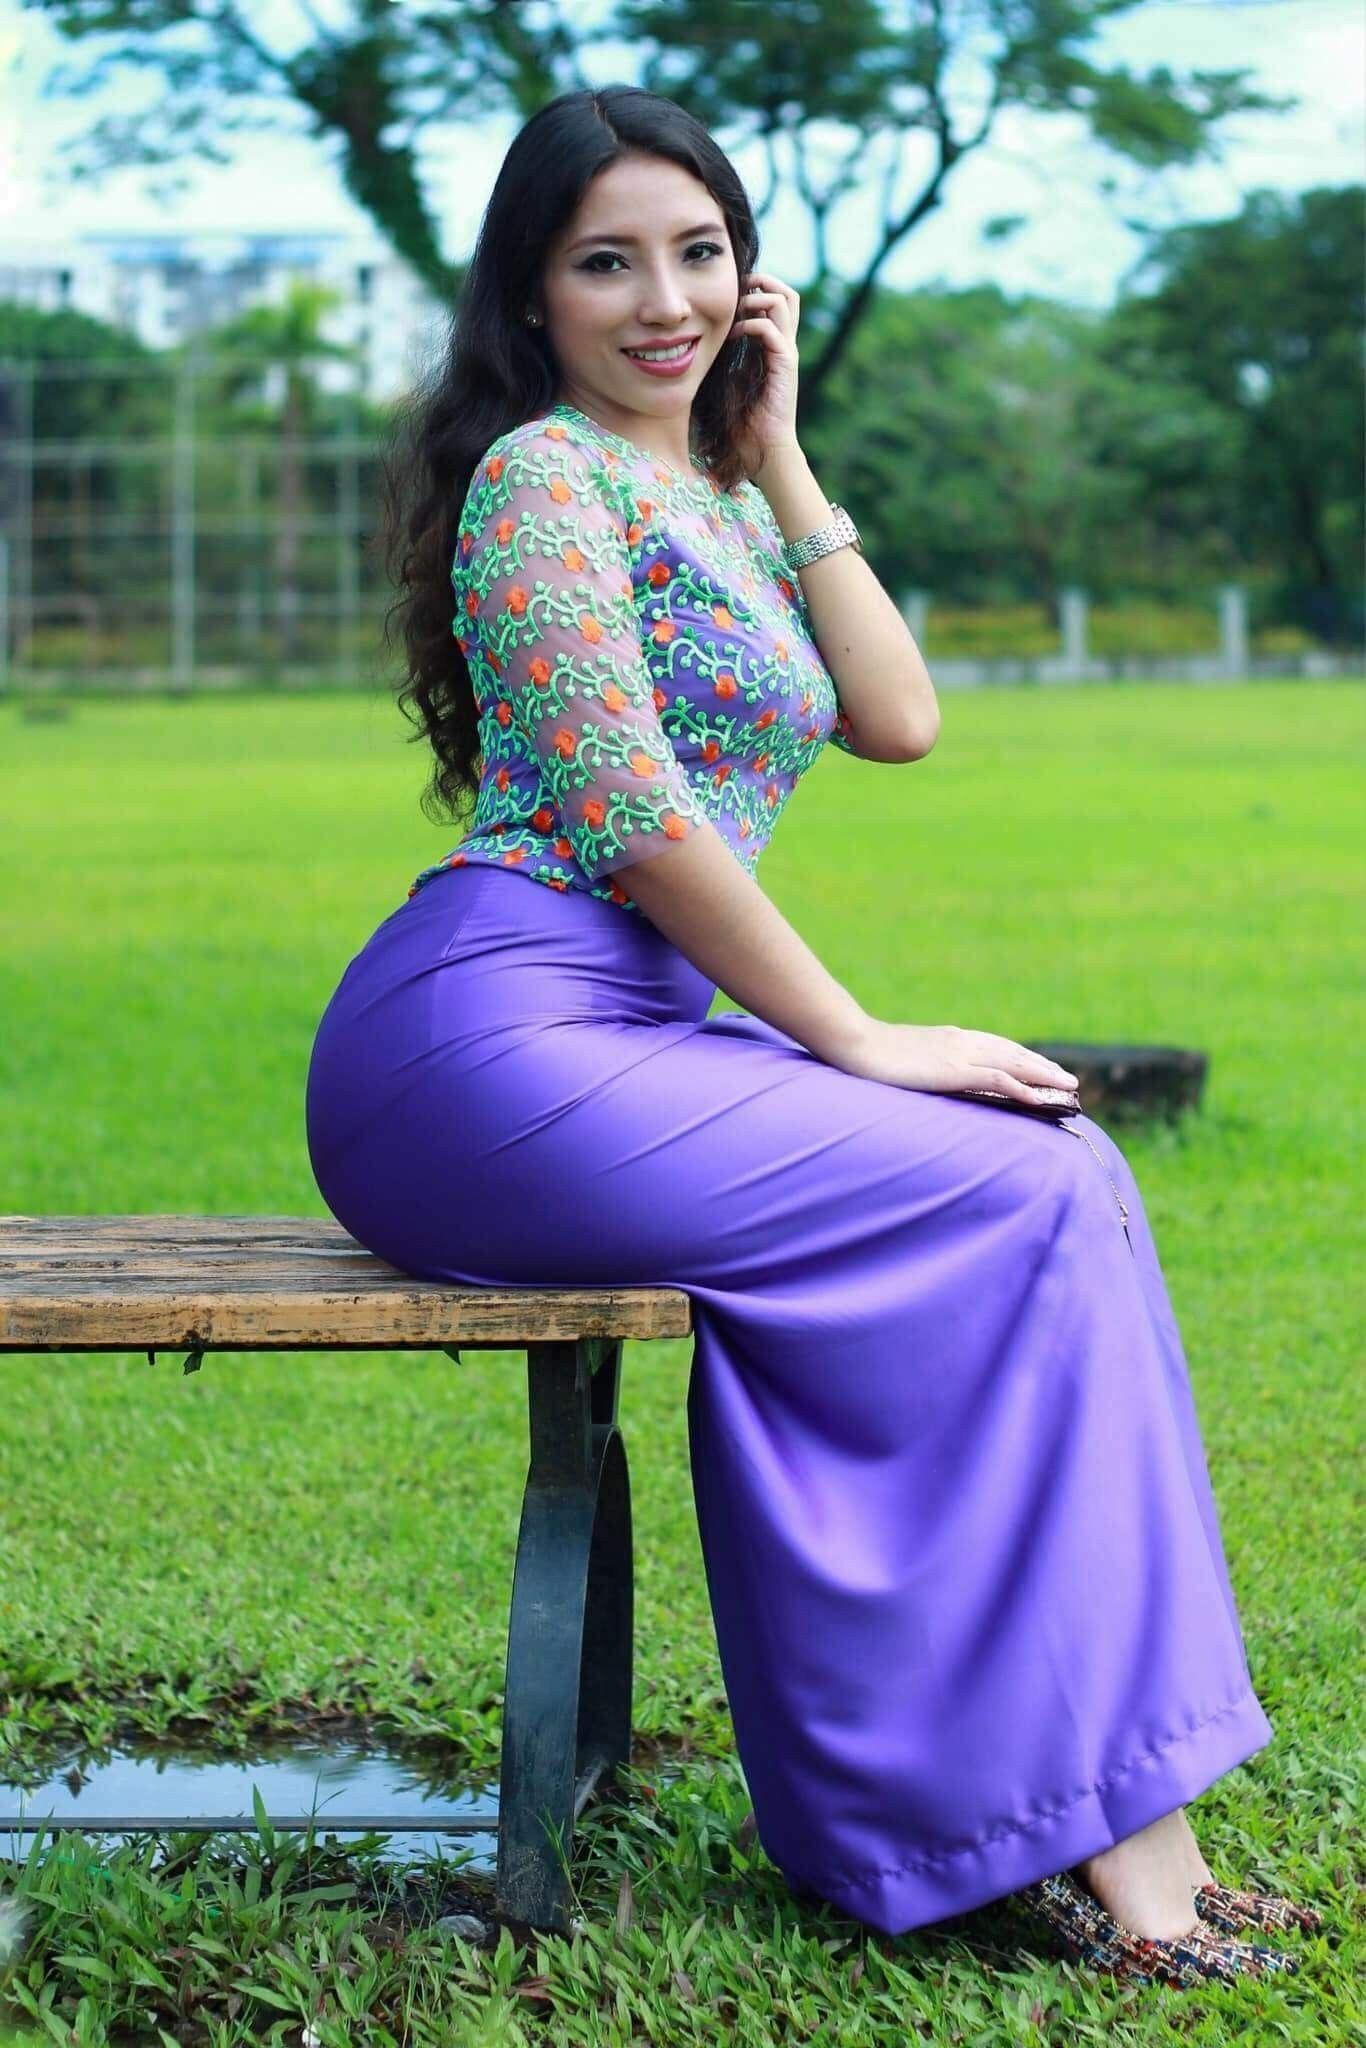 Myanmar funny sexy photo #5